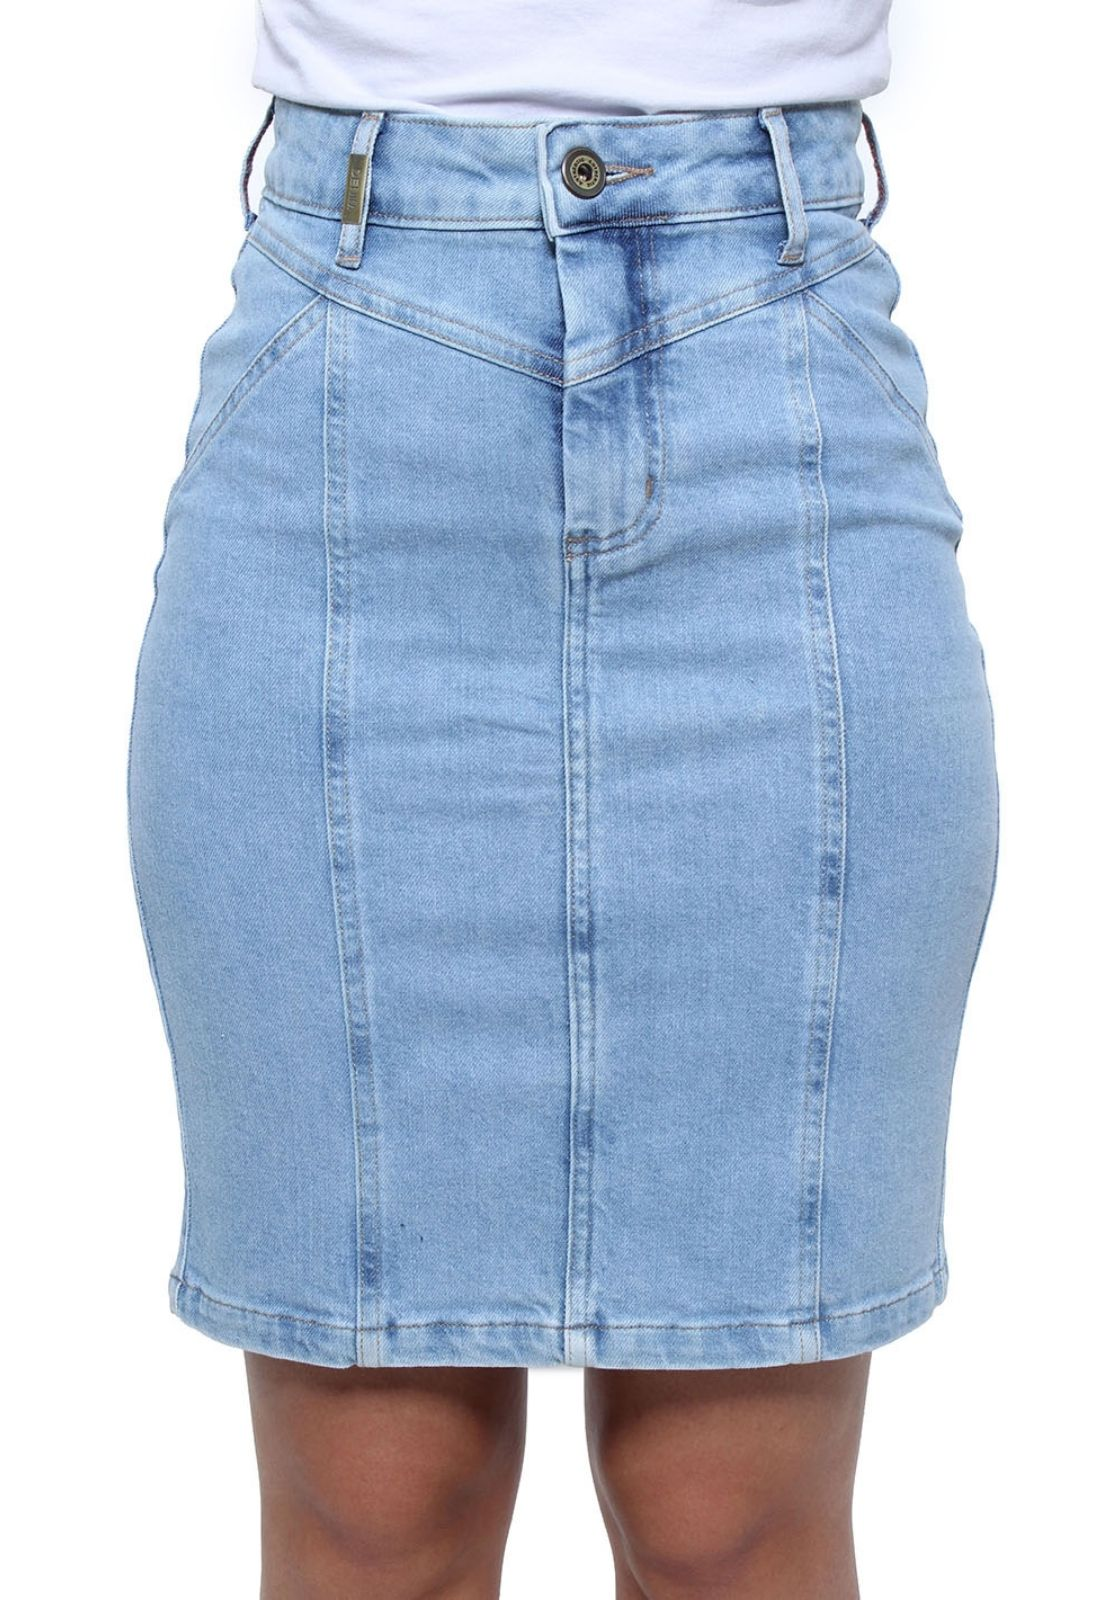 Saia Jeans Cintura Alta Feminina Crocker - 47730  - CROCKER JEANS